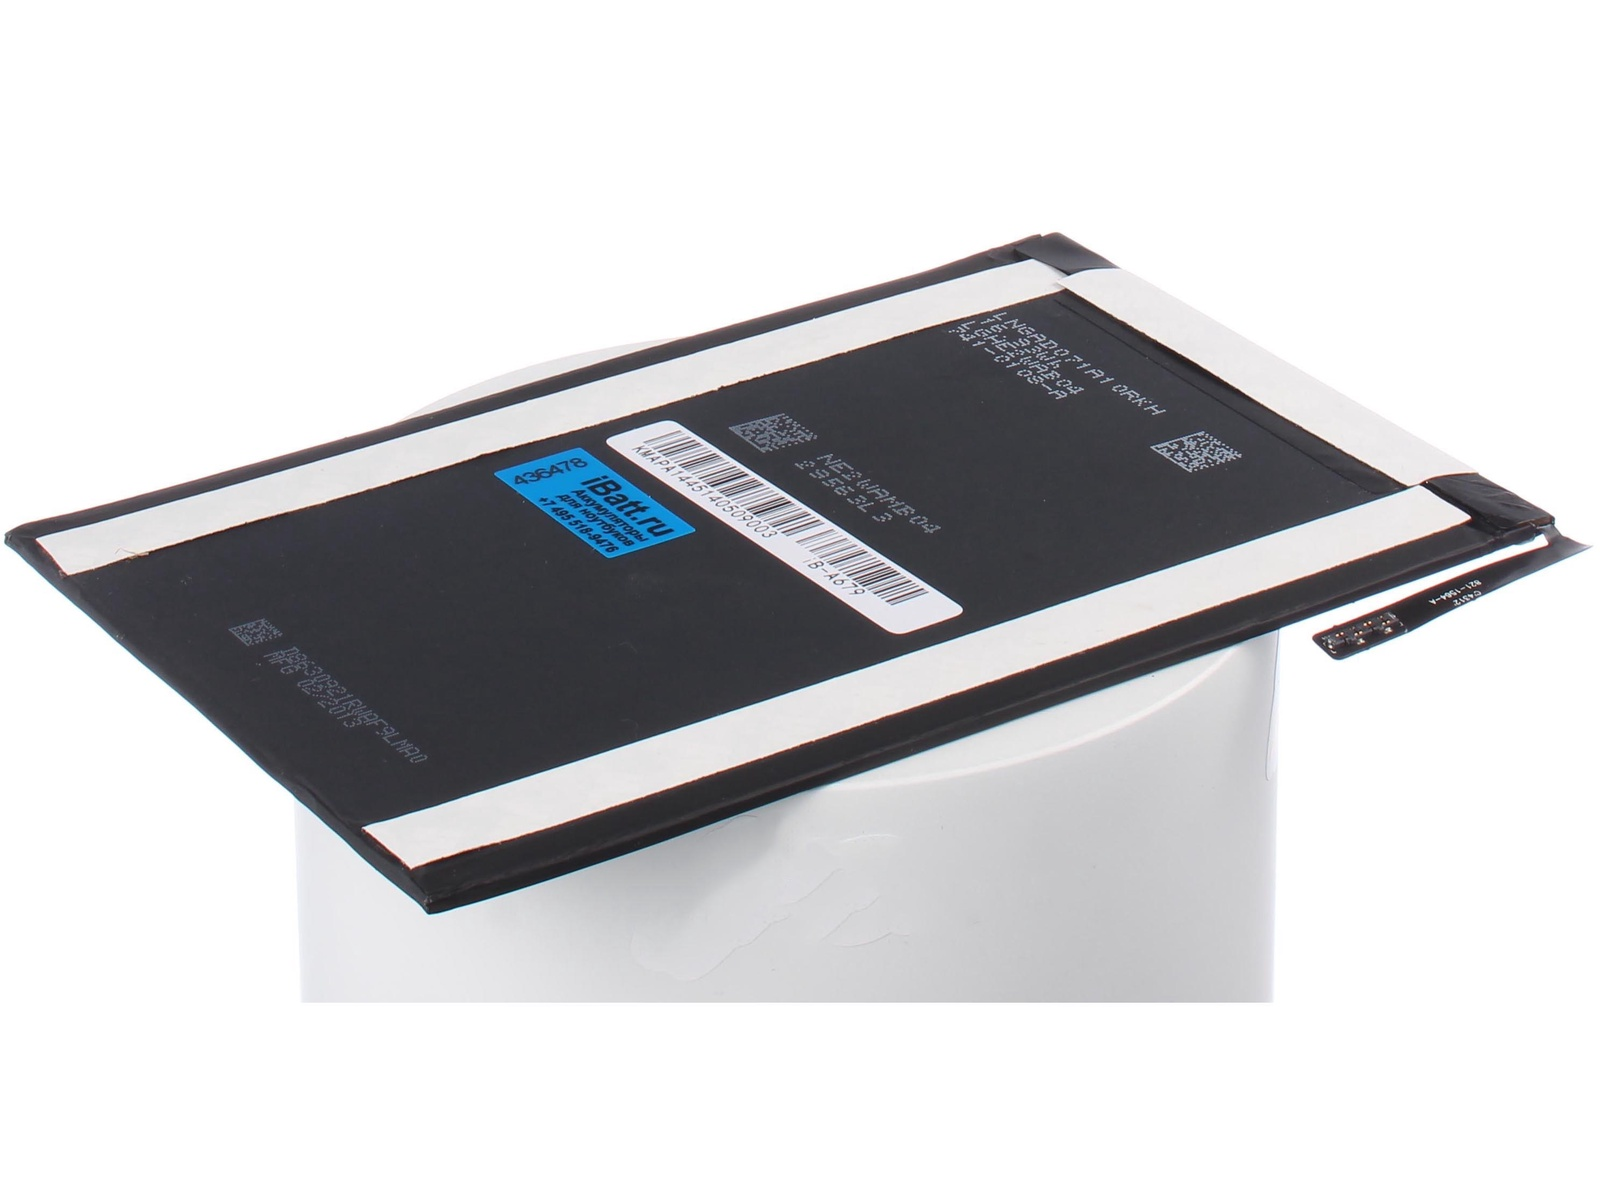 Аккумуляторная батарея iBatt iB-A1-A679 4400mAh для ноутбуков Apple доставка ноутбуков